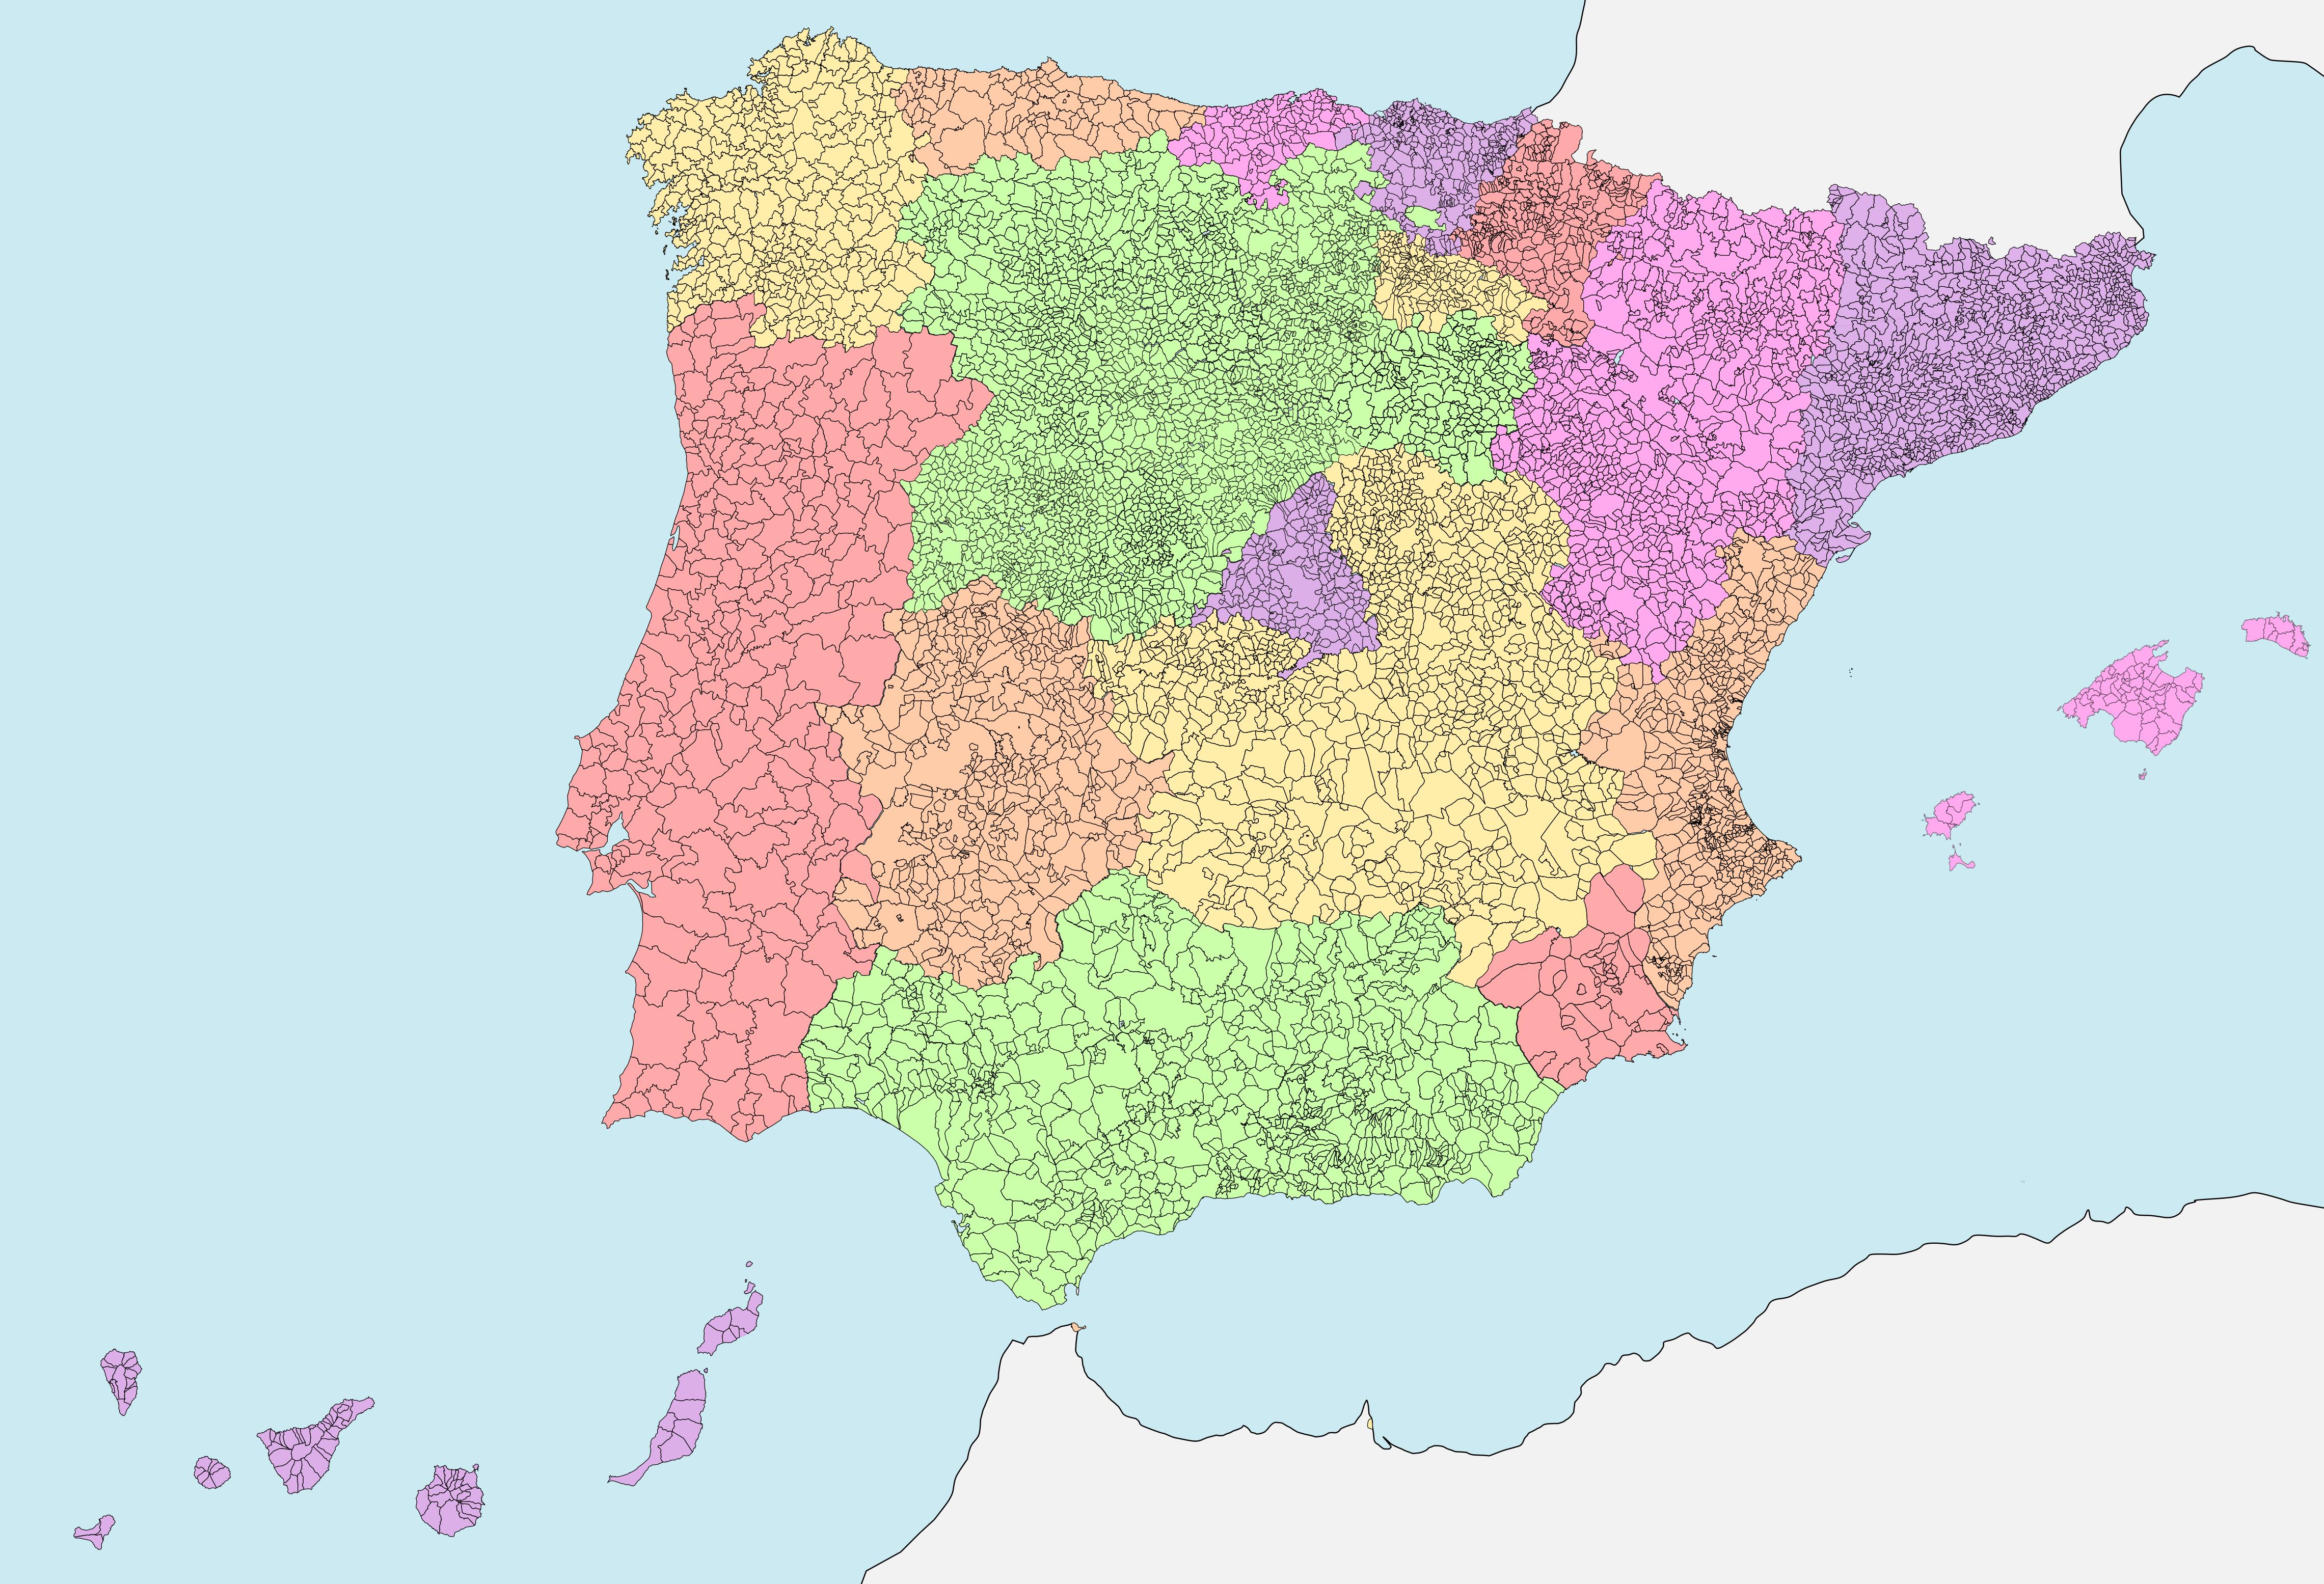 España Y Portugal Mapa.File Mapa Municipal De Espana Y Portugal Png Wikimedia Commons